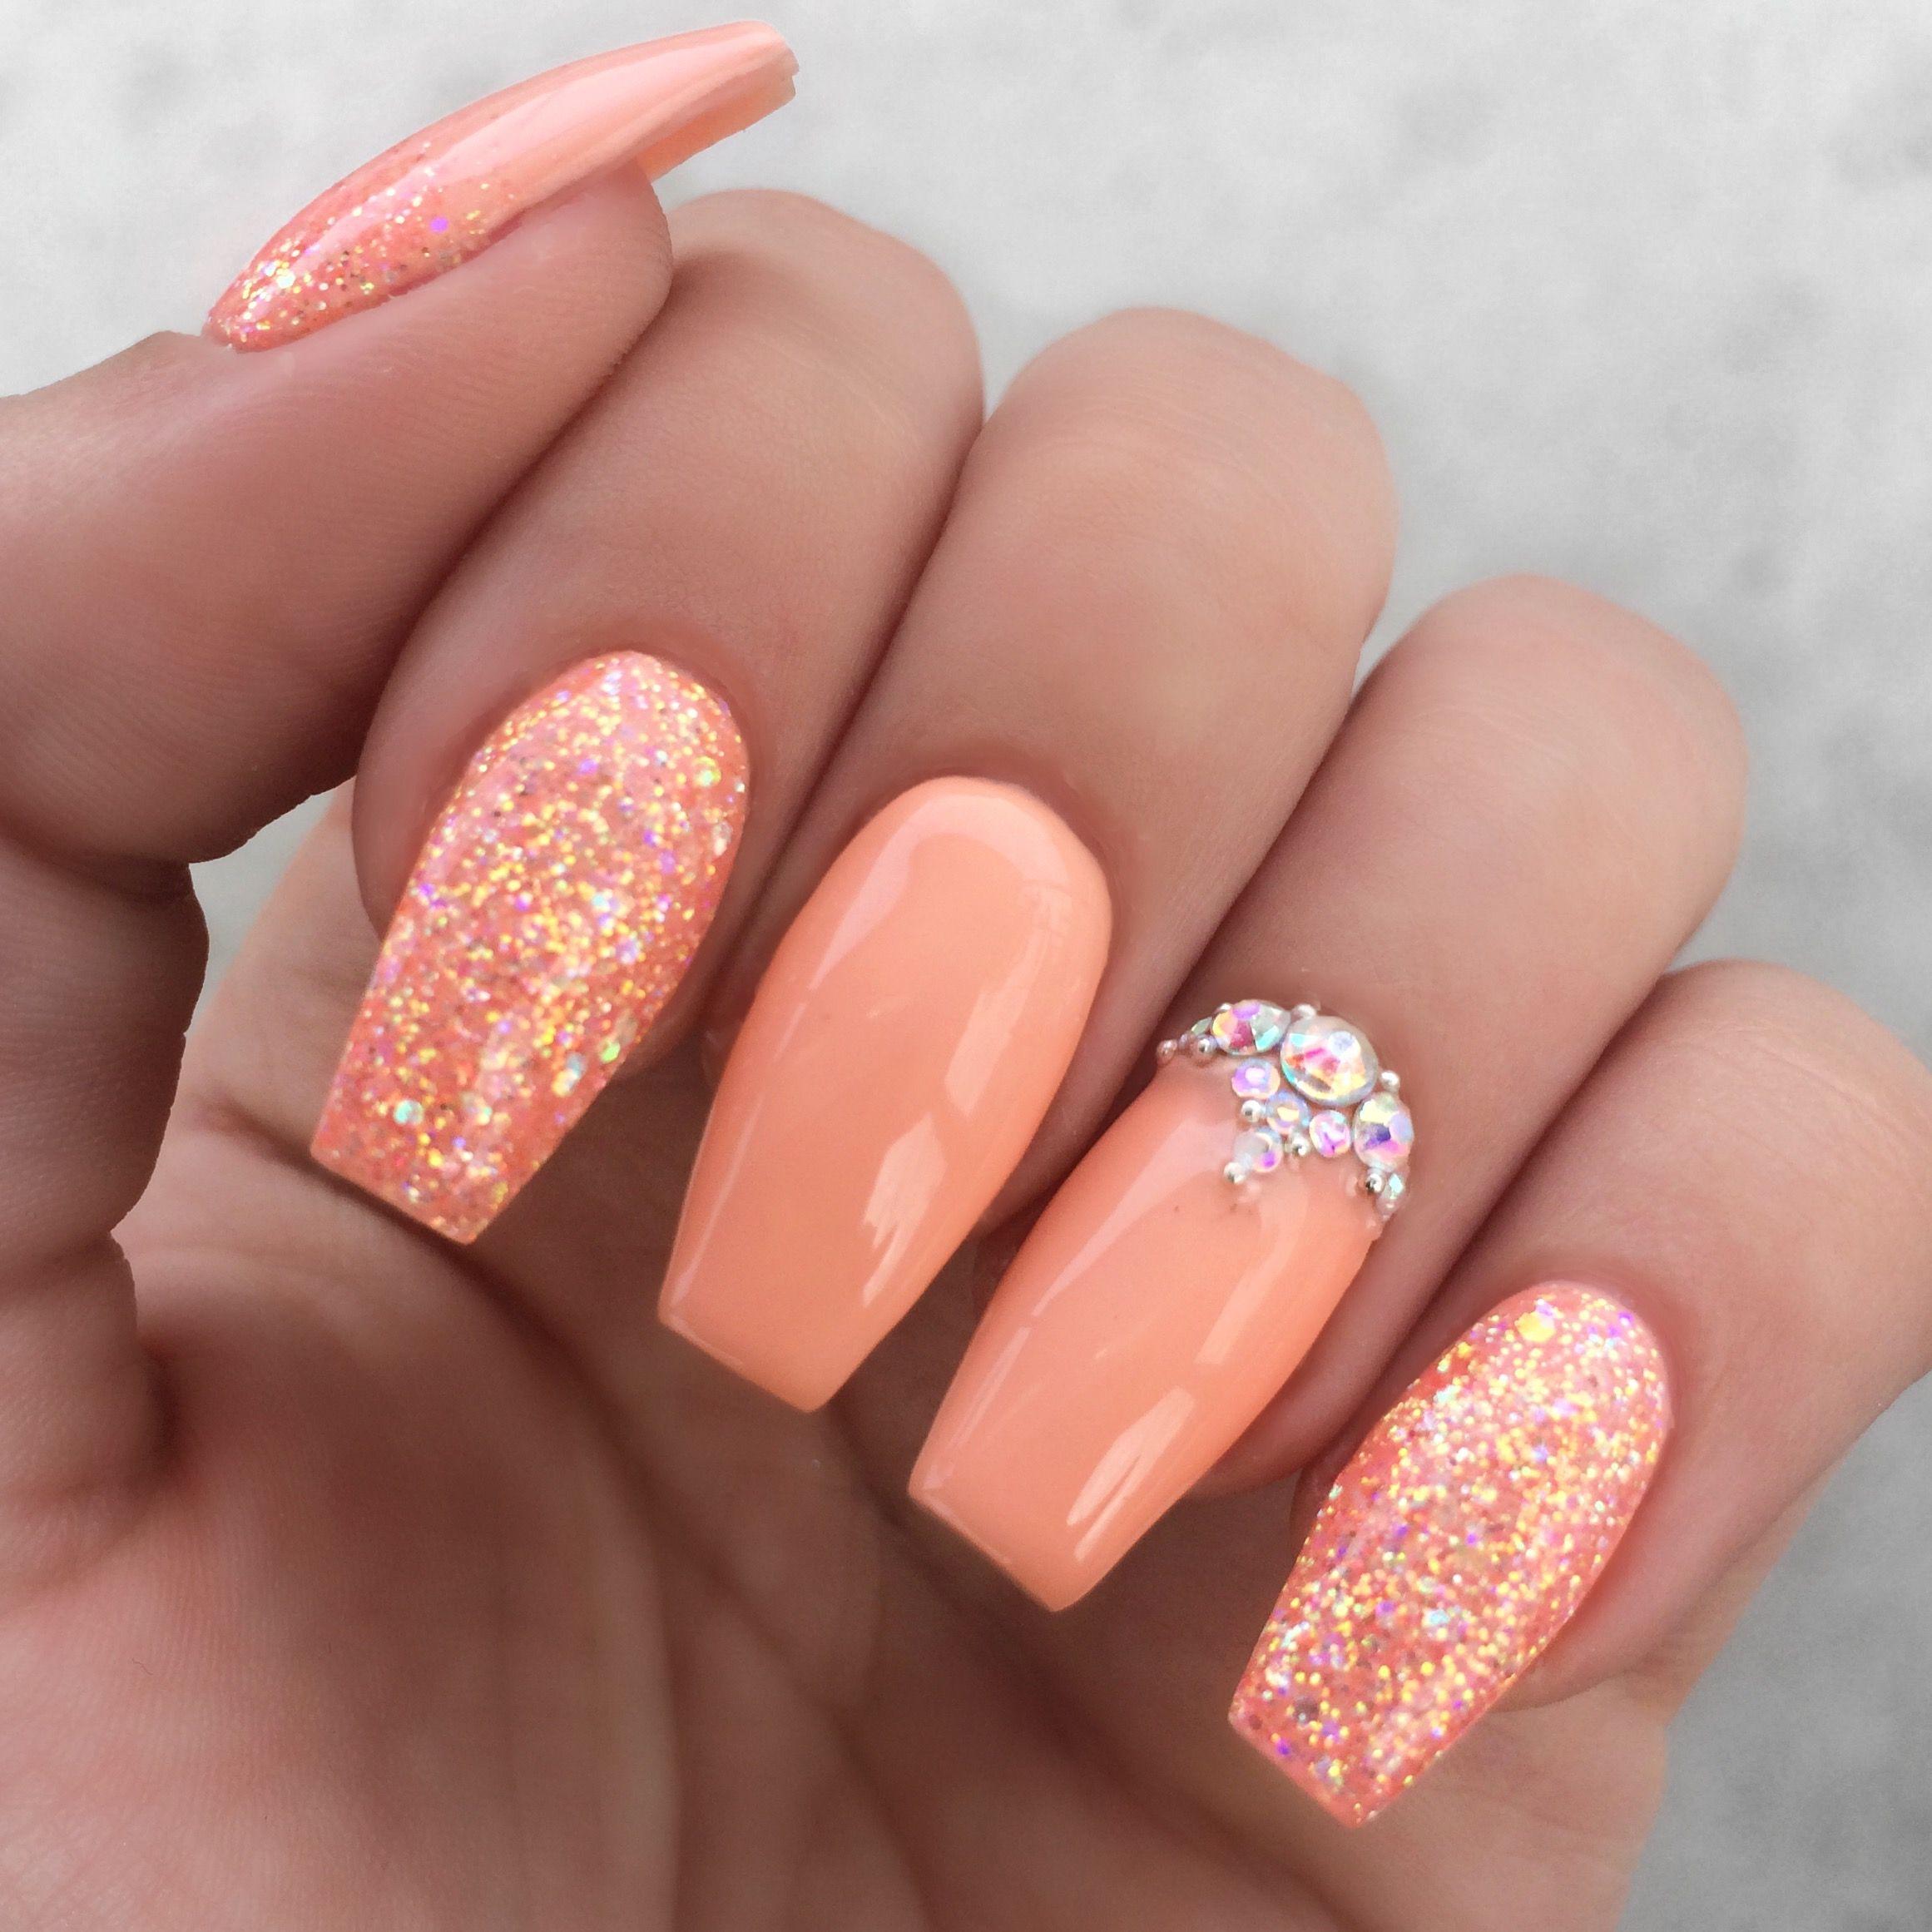 Girly peach glitter rhinestone nails